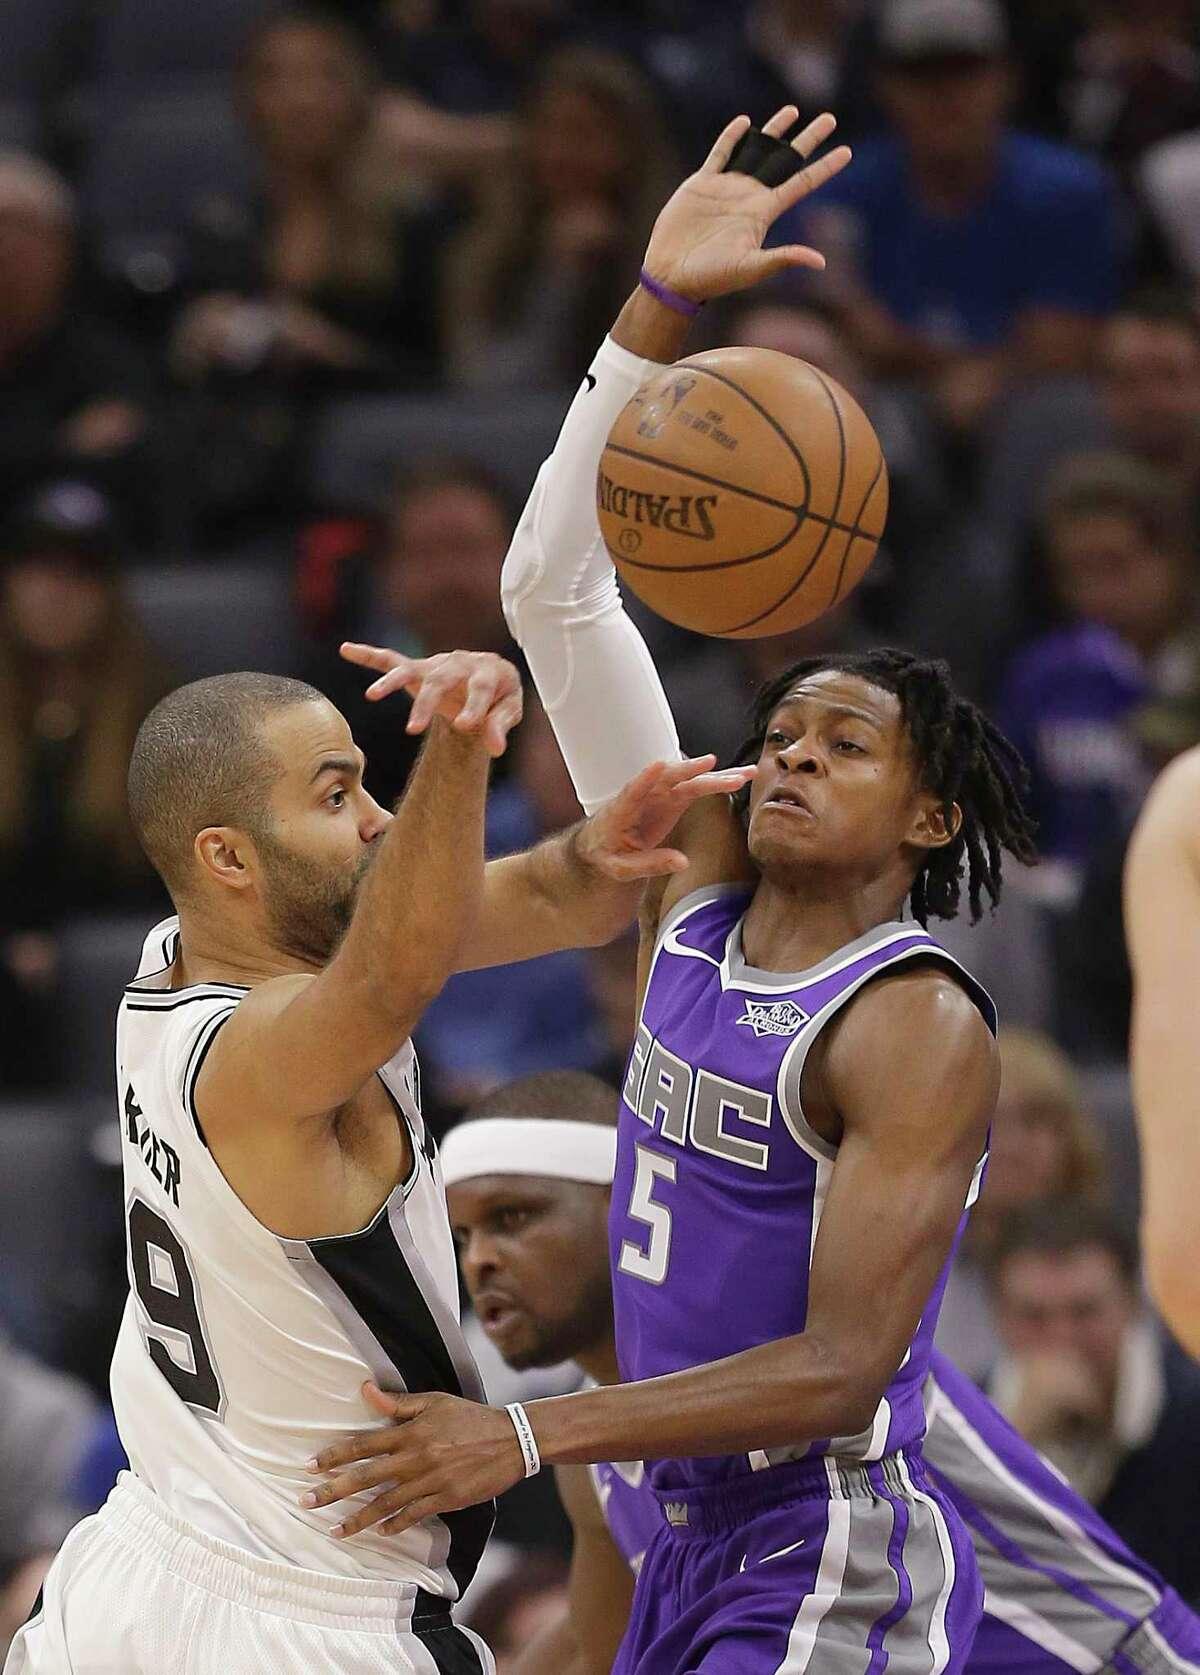 San Antonio Spurs guard Tony Parker, left, pass against Sacramento Kings guard De'Aaron Fox during the first quarter of an NBA basketball game Monday, Jan. 8, 2018, in Sacramento, Calif. (AP Photo/Rich Pedroncelli)